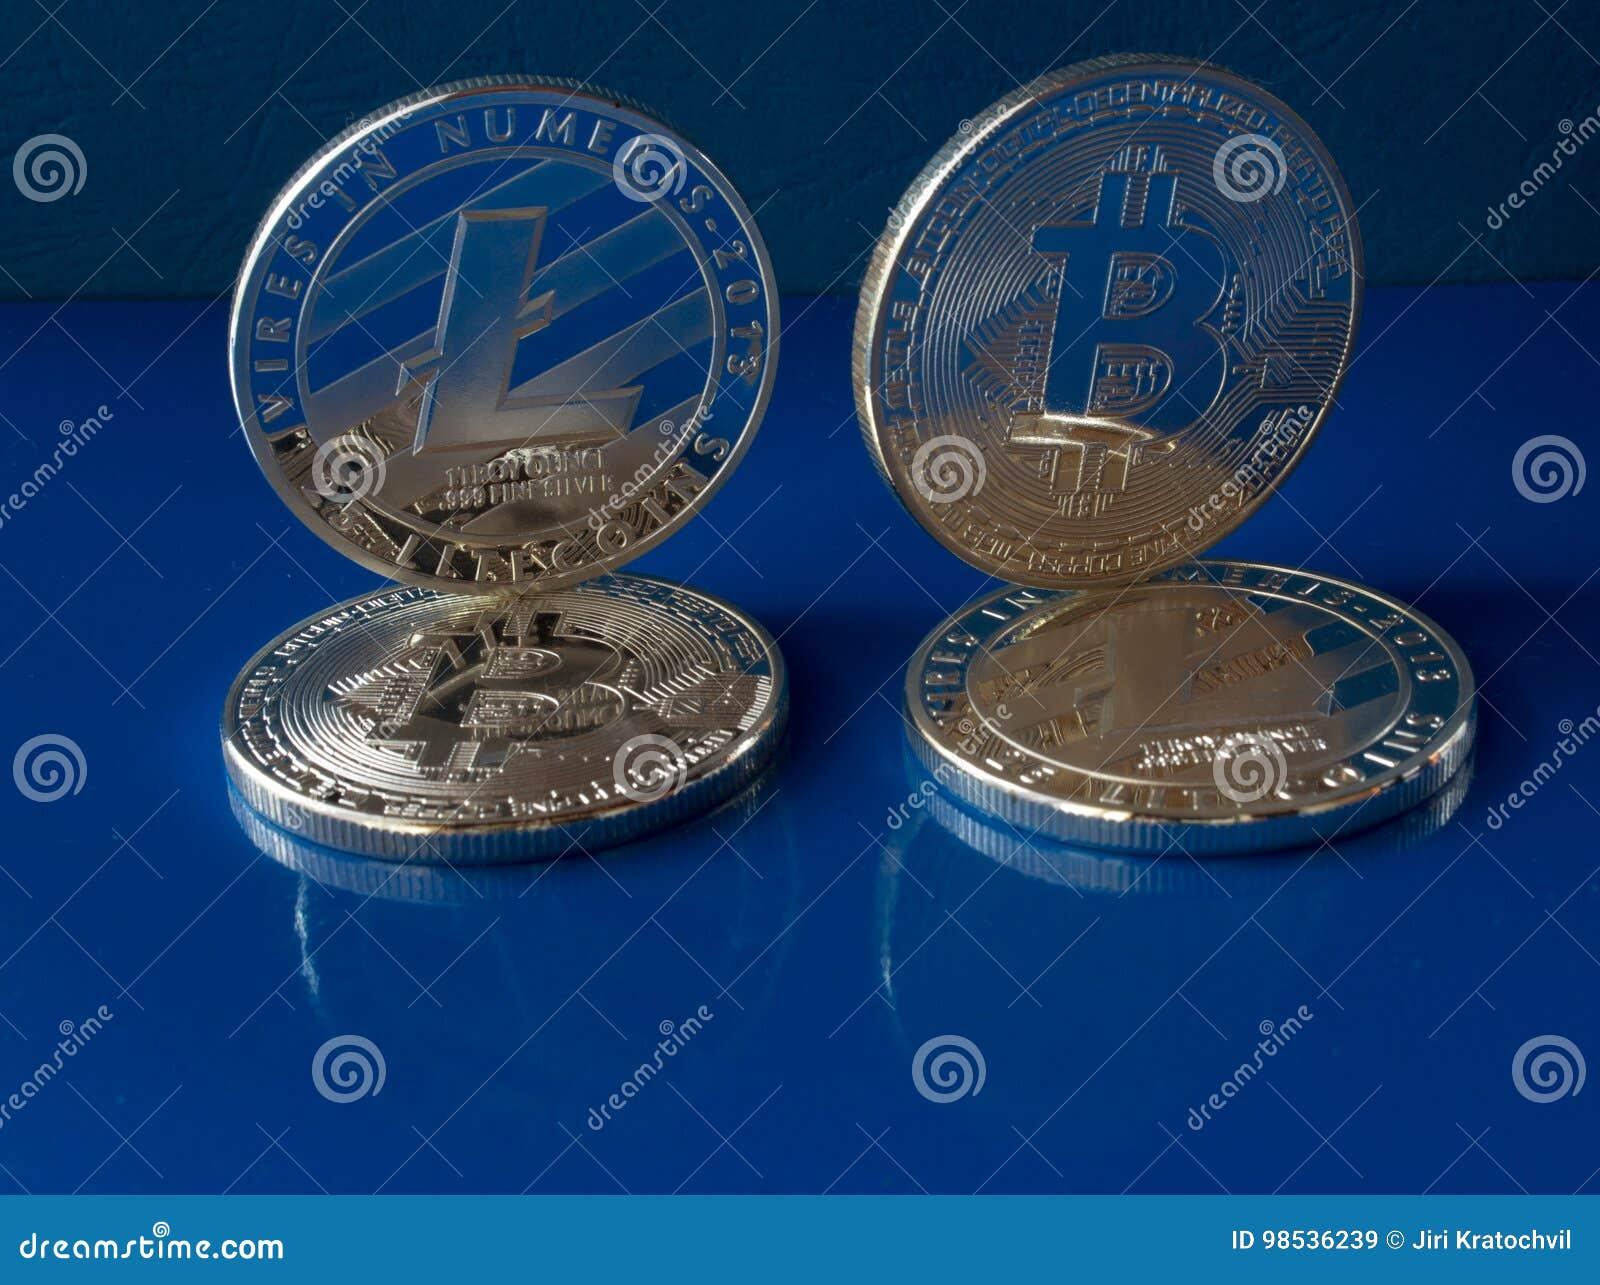 Bitcoin kursas, kitimo grafikas - Kiek eina bitcoin